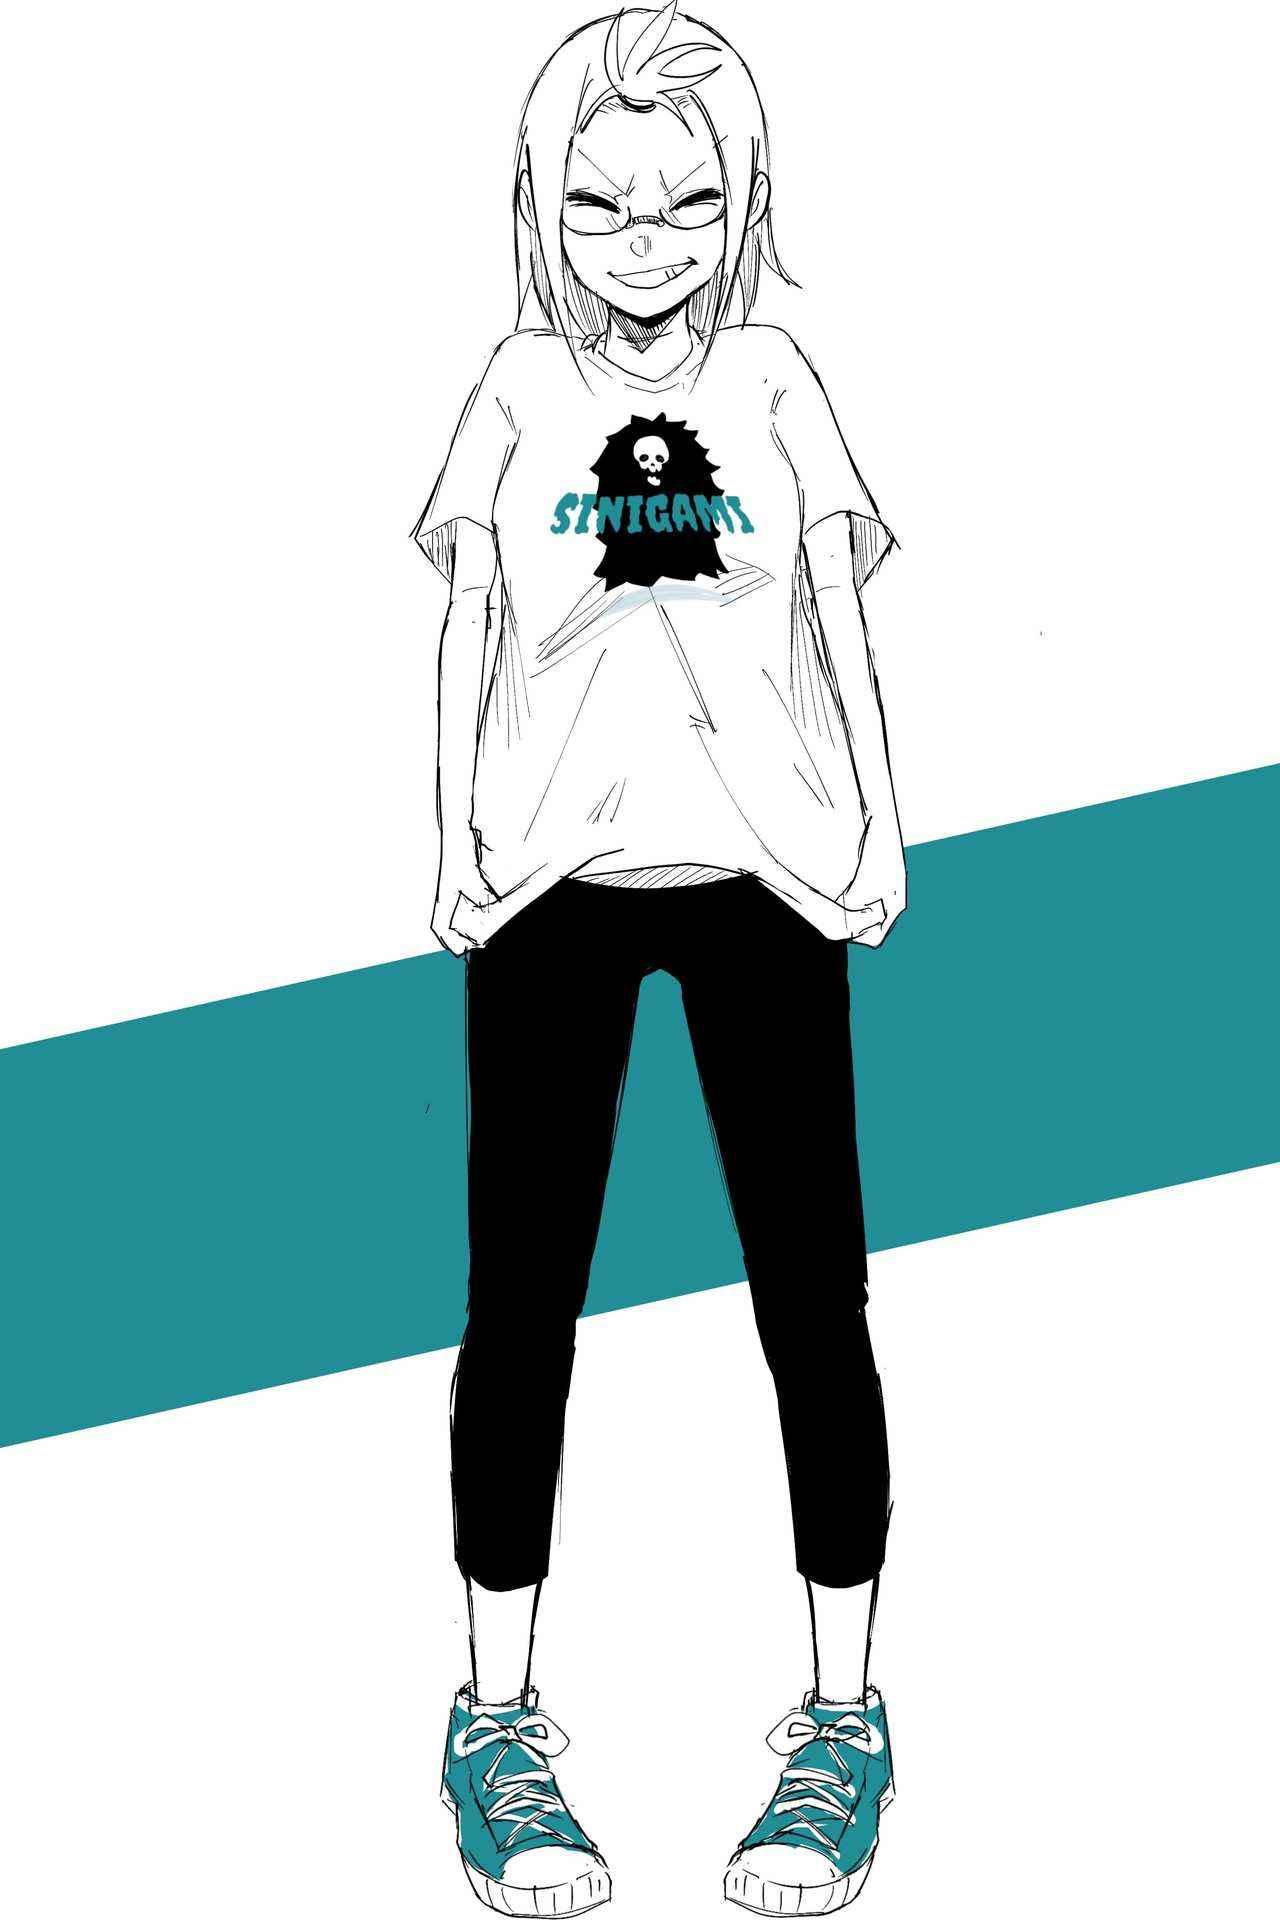 https://img3.nineanime.com/comics/pic4/8/47688/2906936/6928deac51a9dcc1f063ccec46d3c067.jpg Page 1